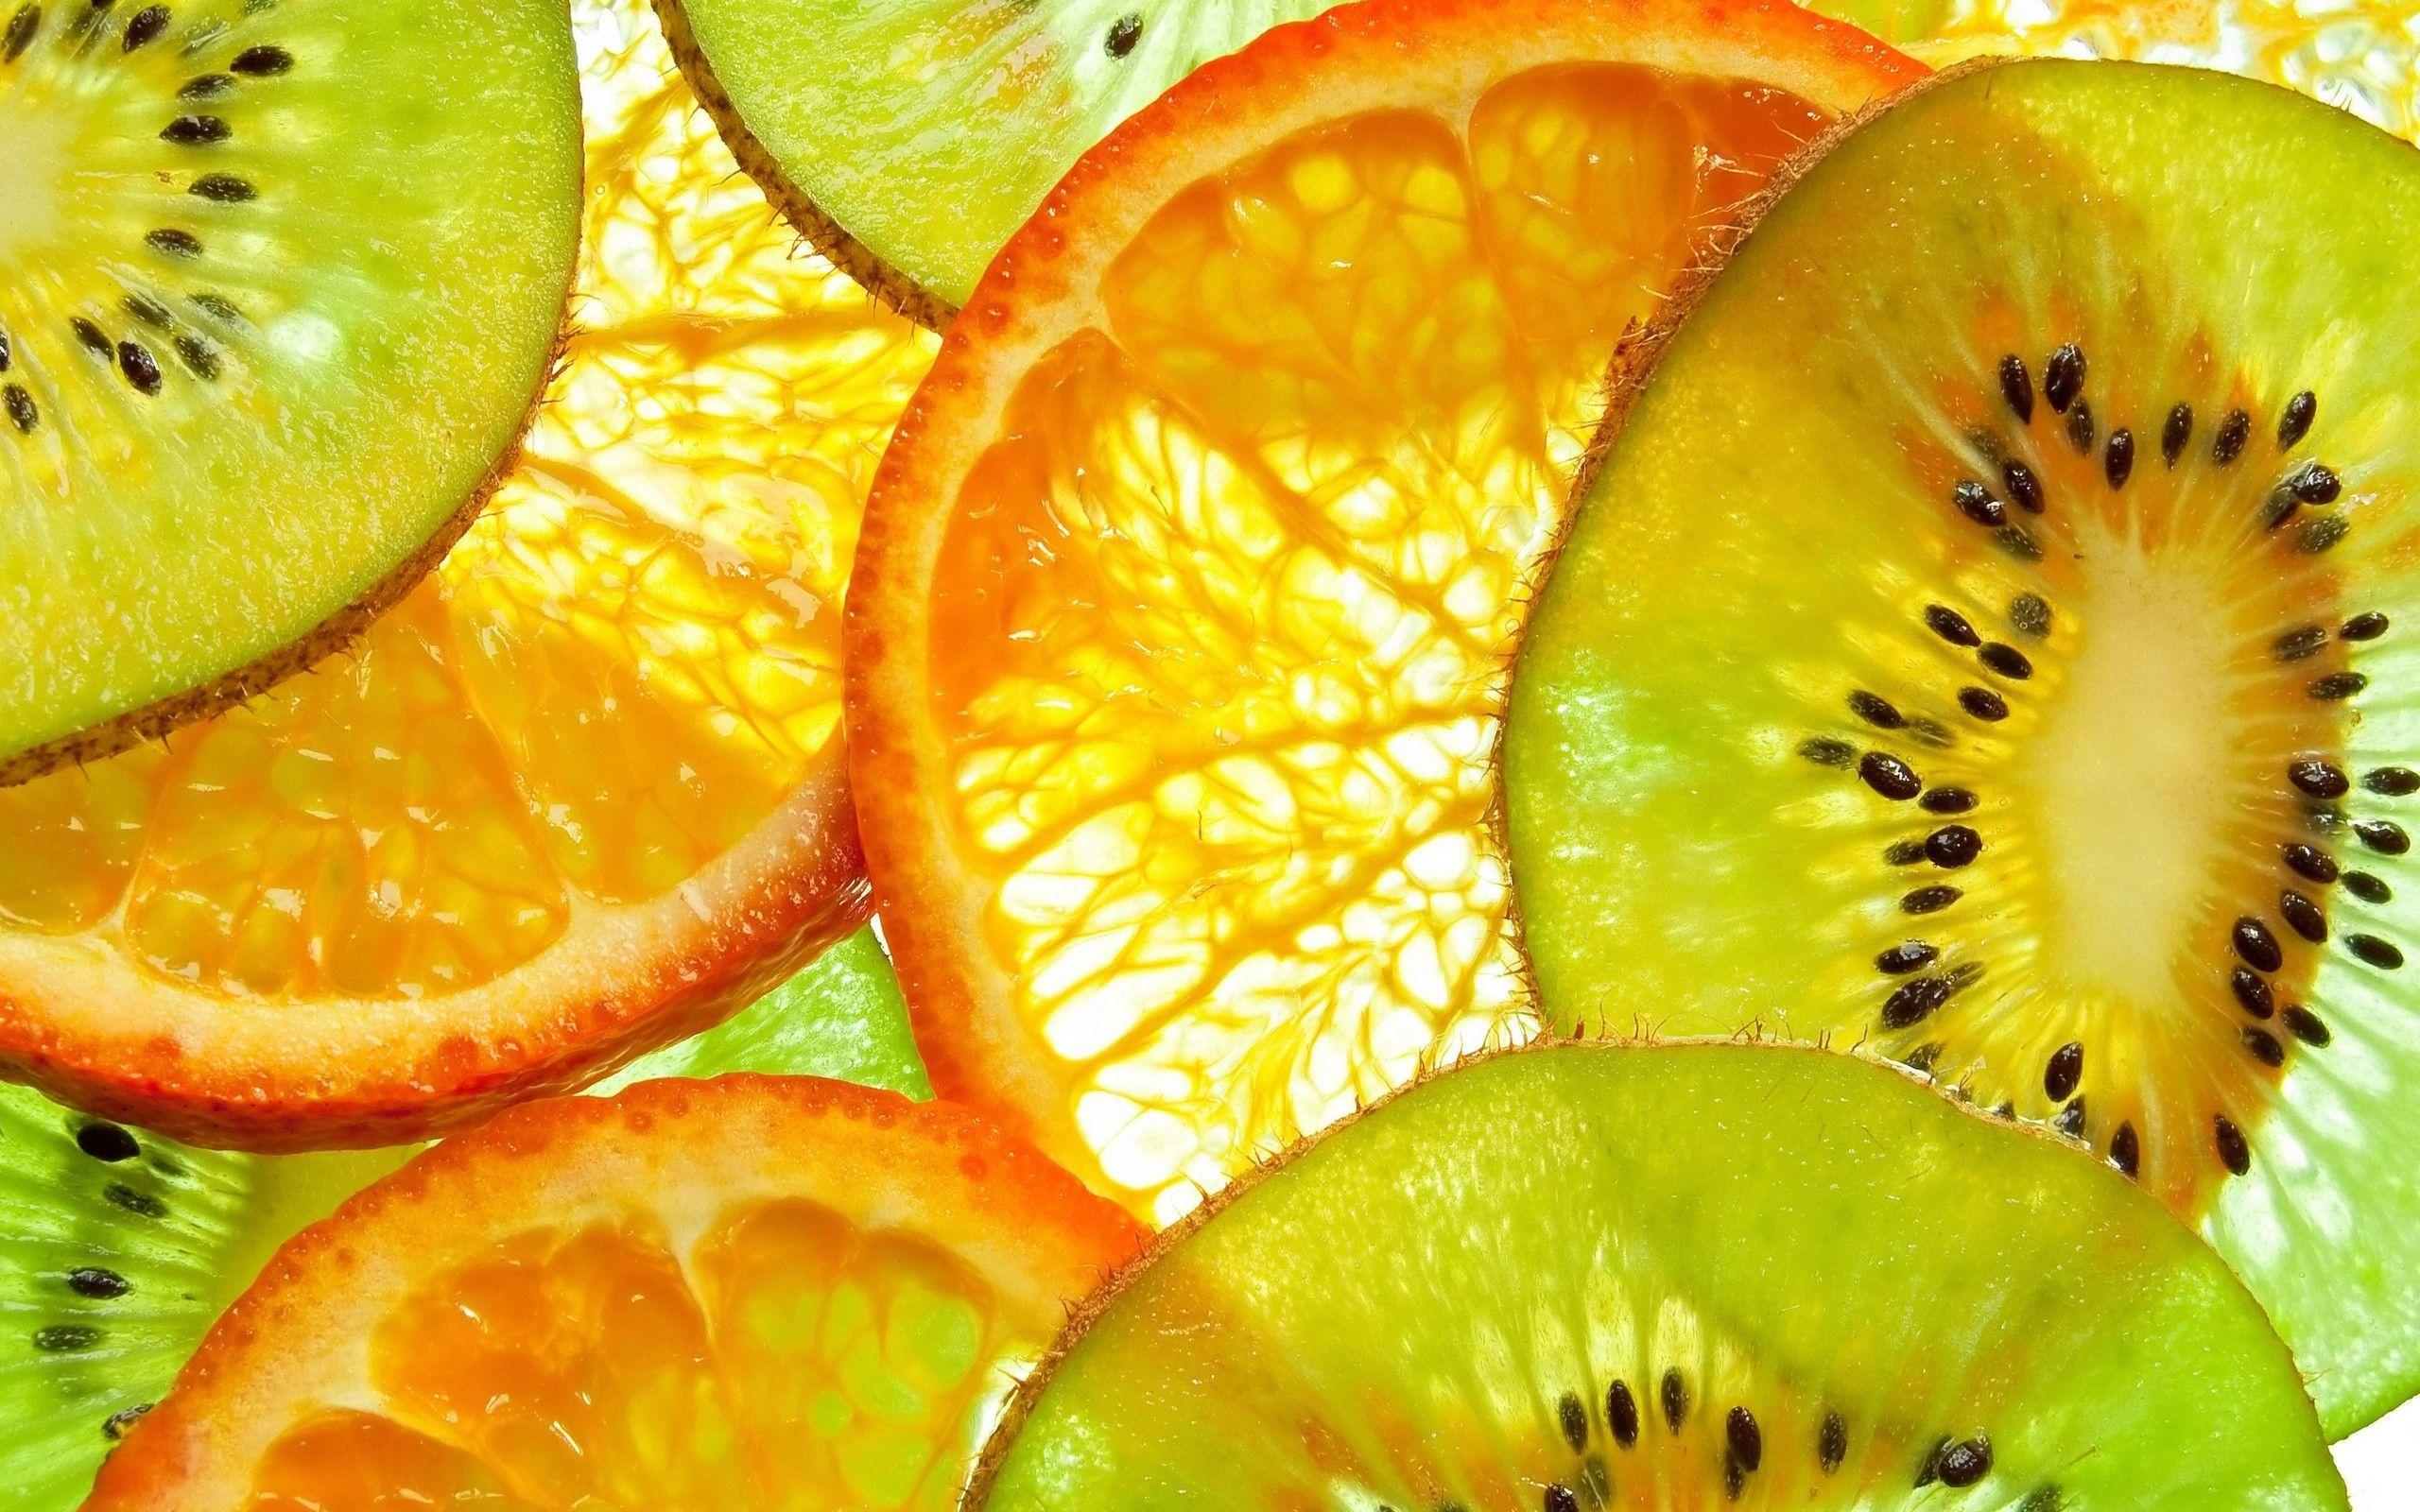 Fruits Hd Wallpapers Cool Desktop Backgrounds